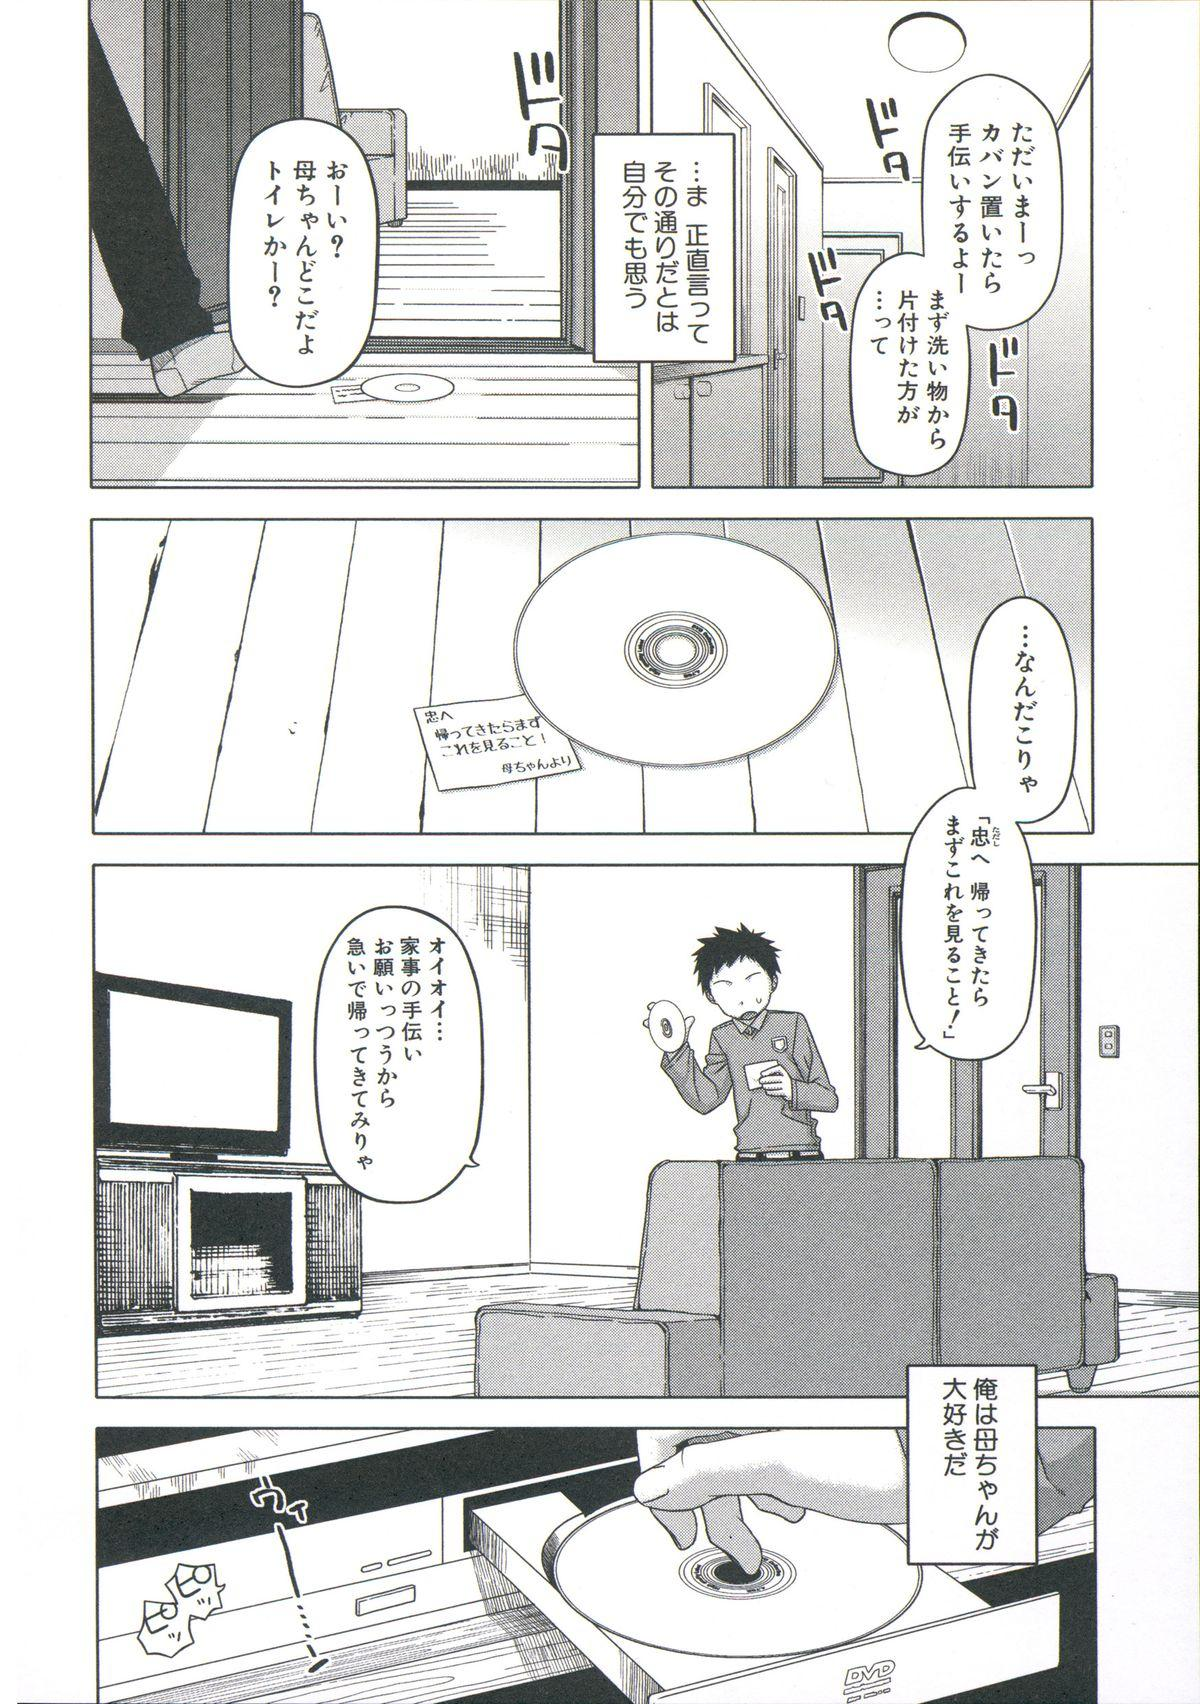 [Takatsu] Ou-sama Appli - King App 72